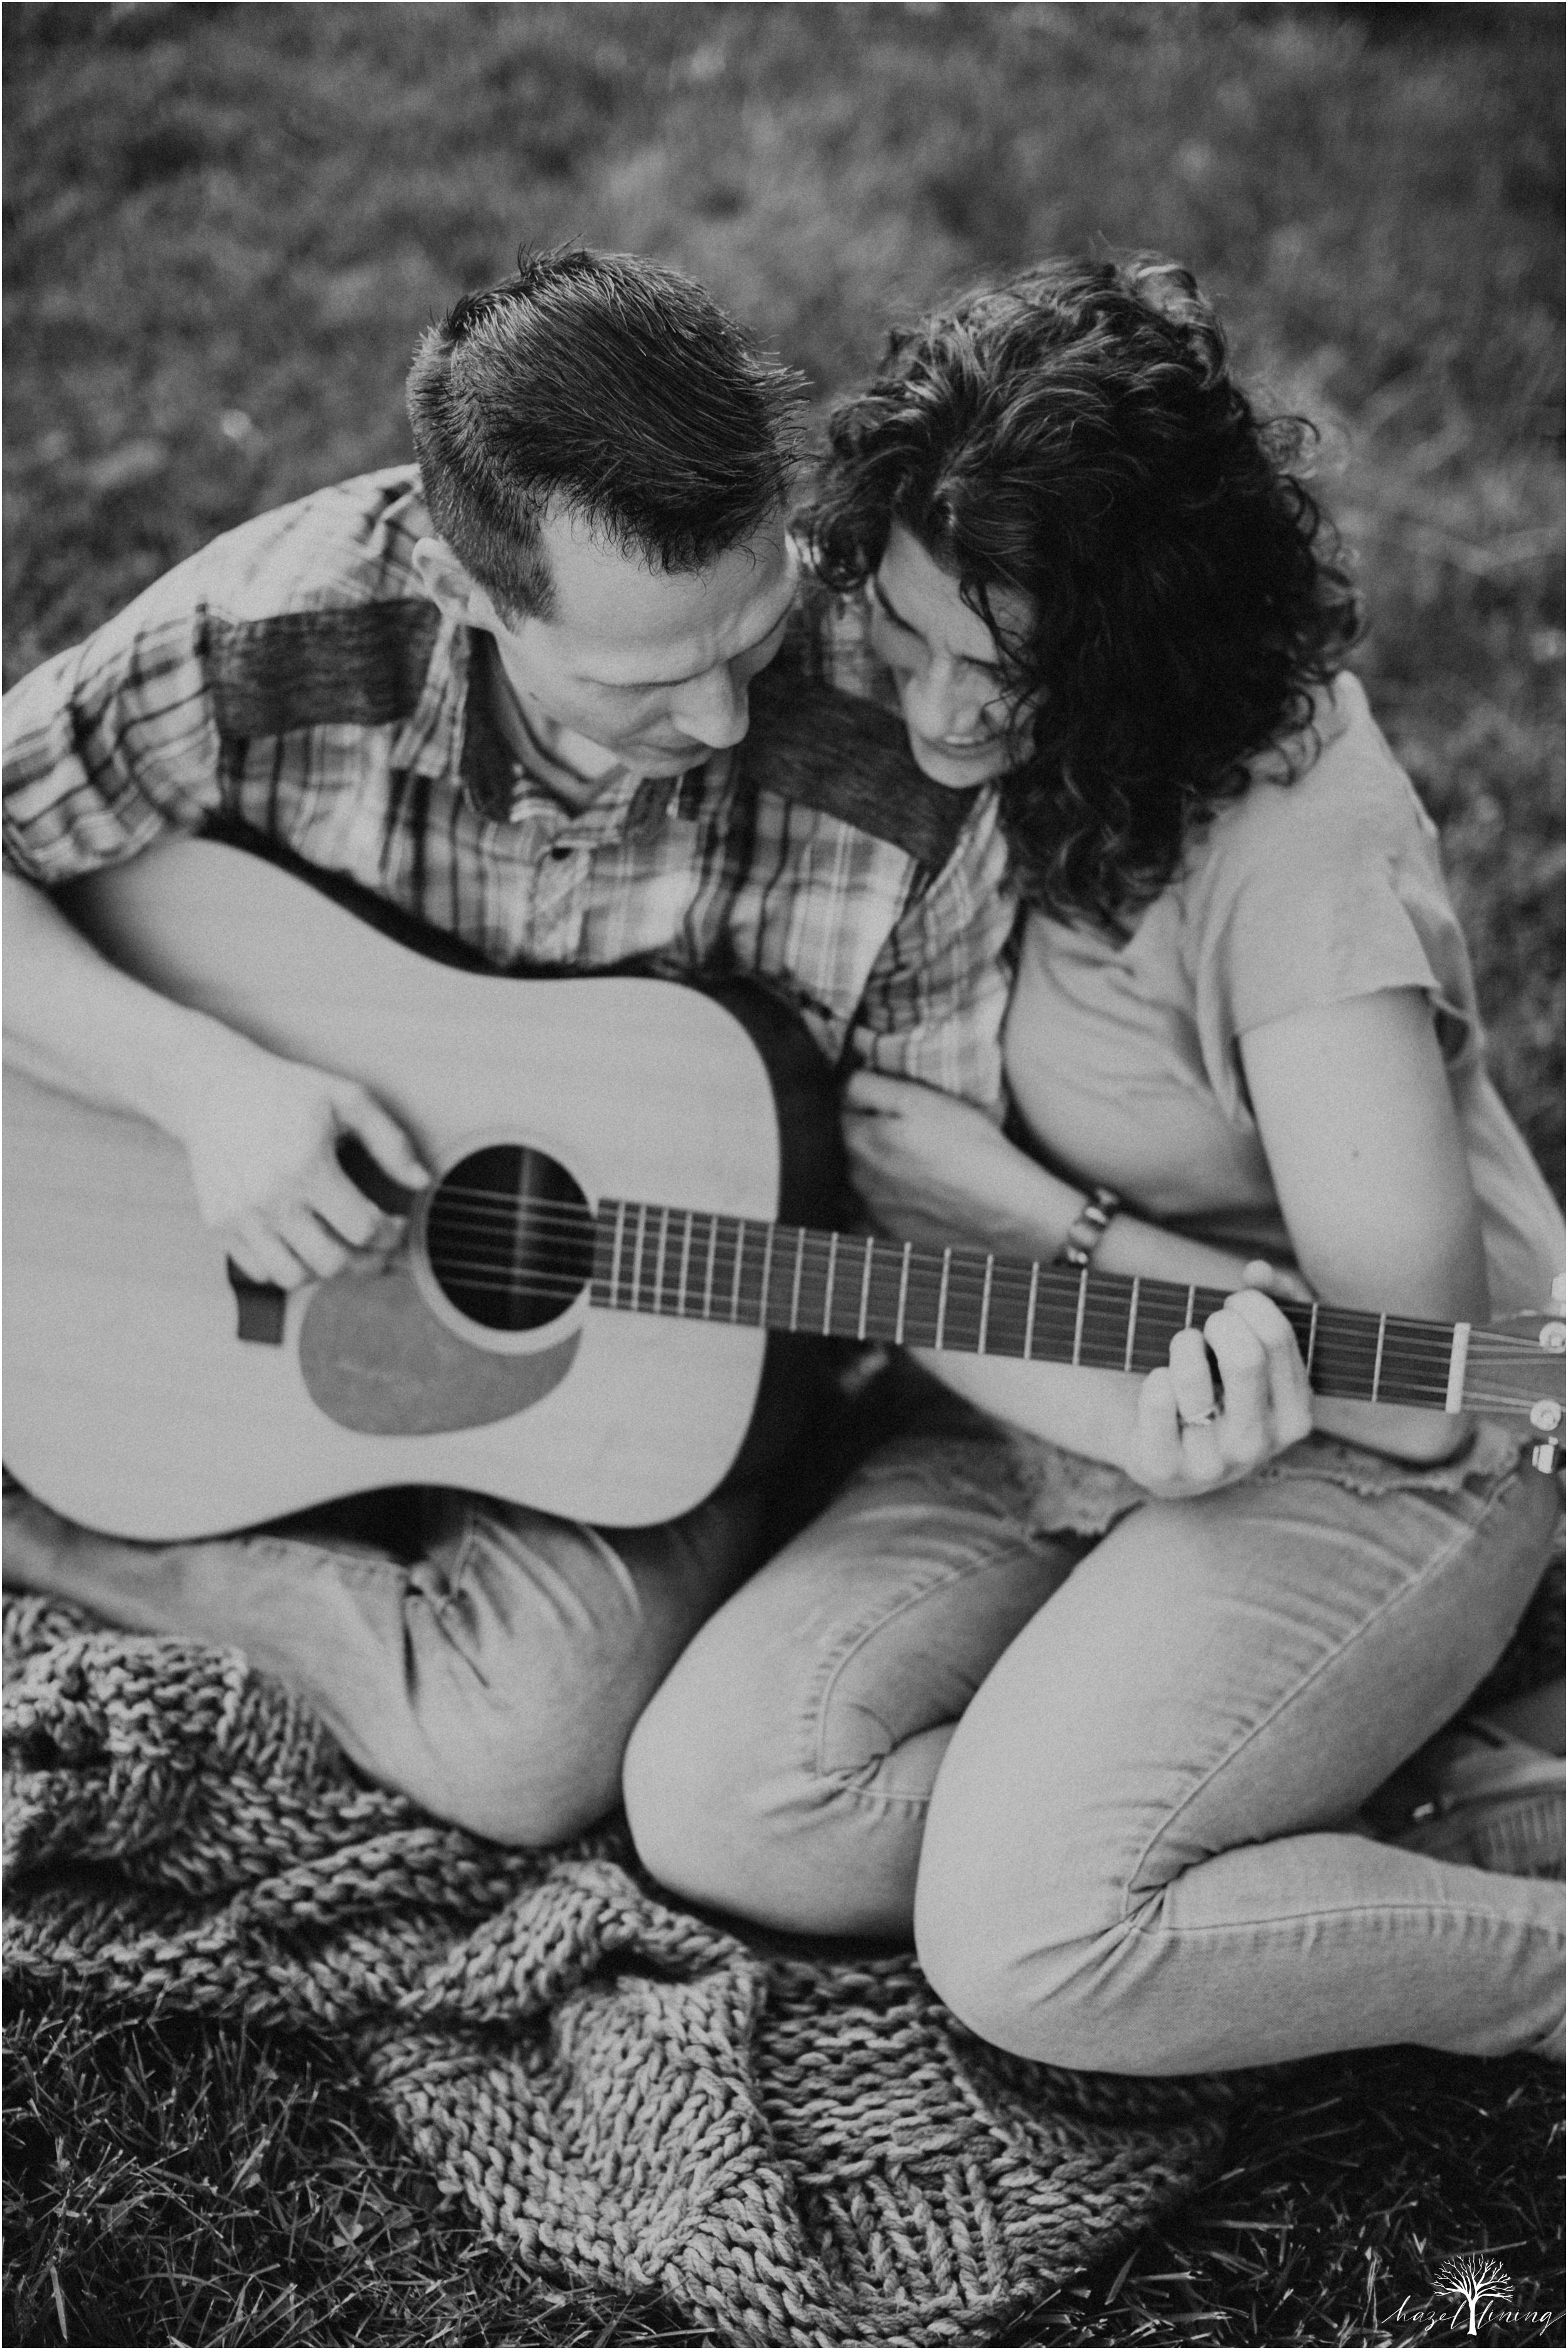 pete-rachelle-sawadski-20-year-anniversary-portrait-session-hazel-lining-photography-destination-elopement-wedding-engagement-photography_0299.jpg